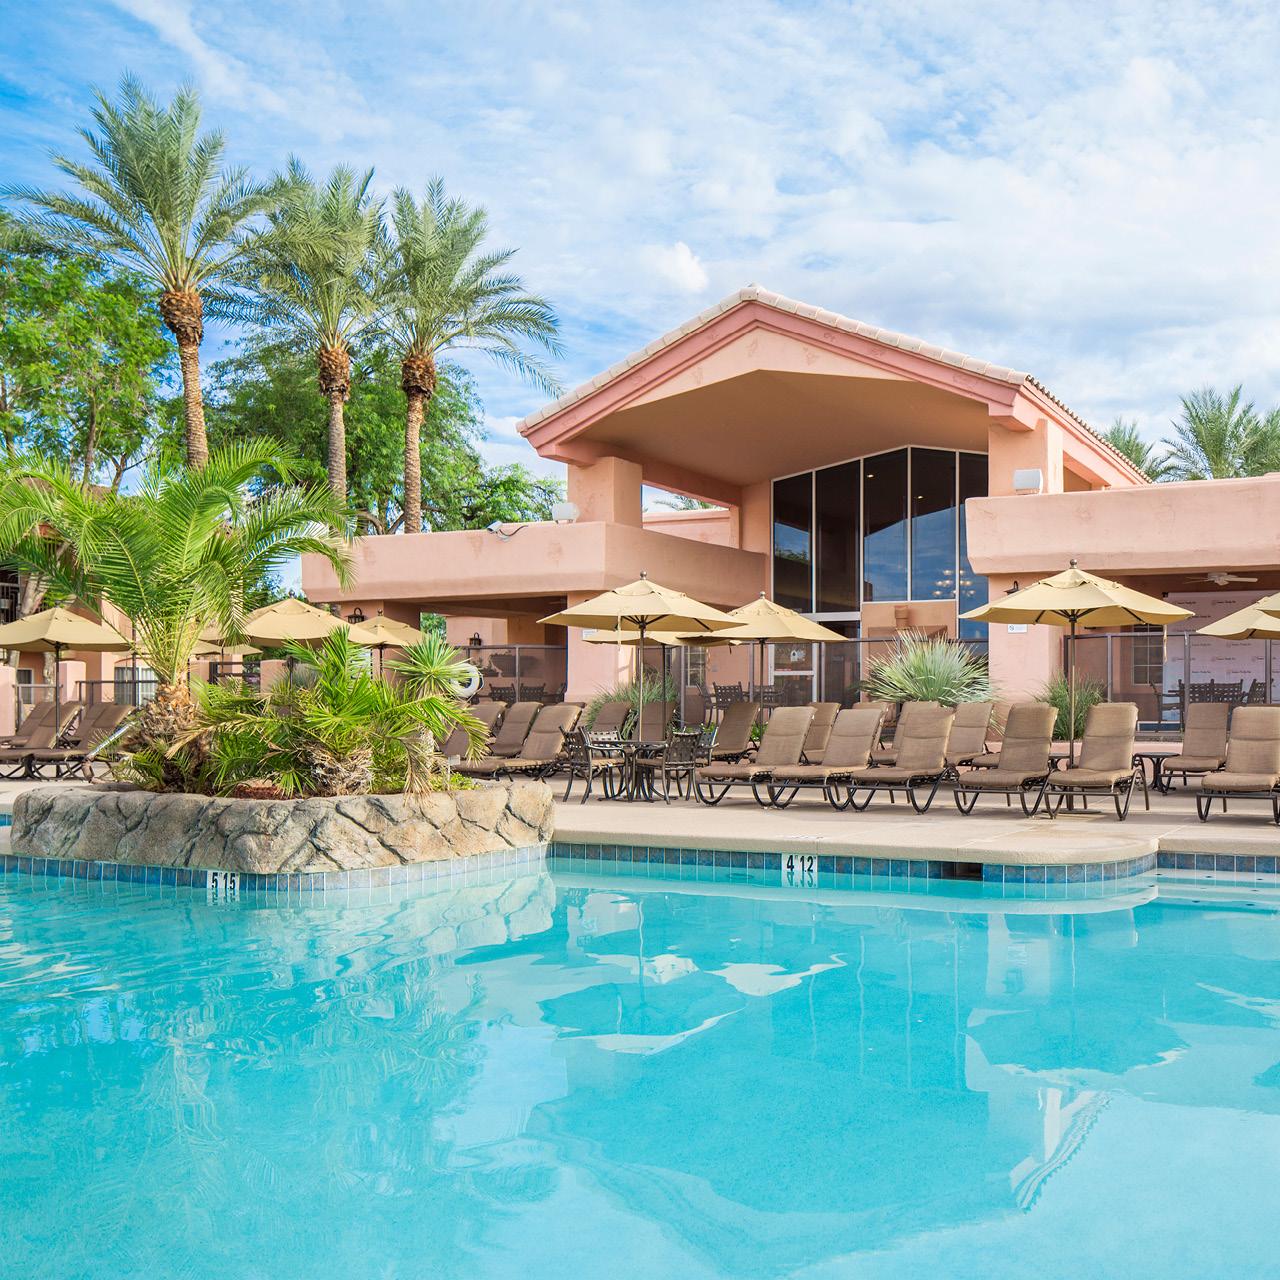 Scottsdale Villa Mirage Outdoor Pool